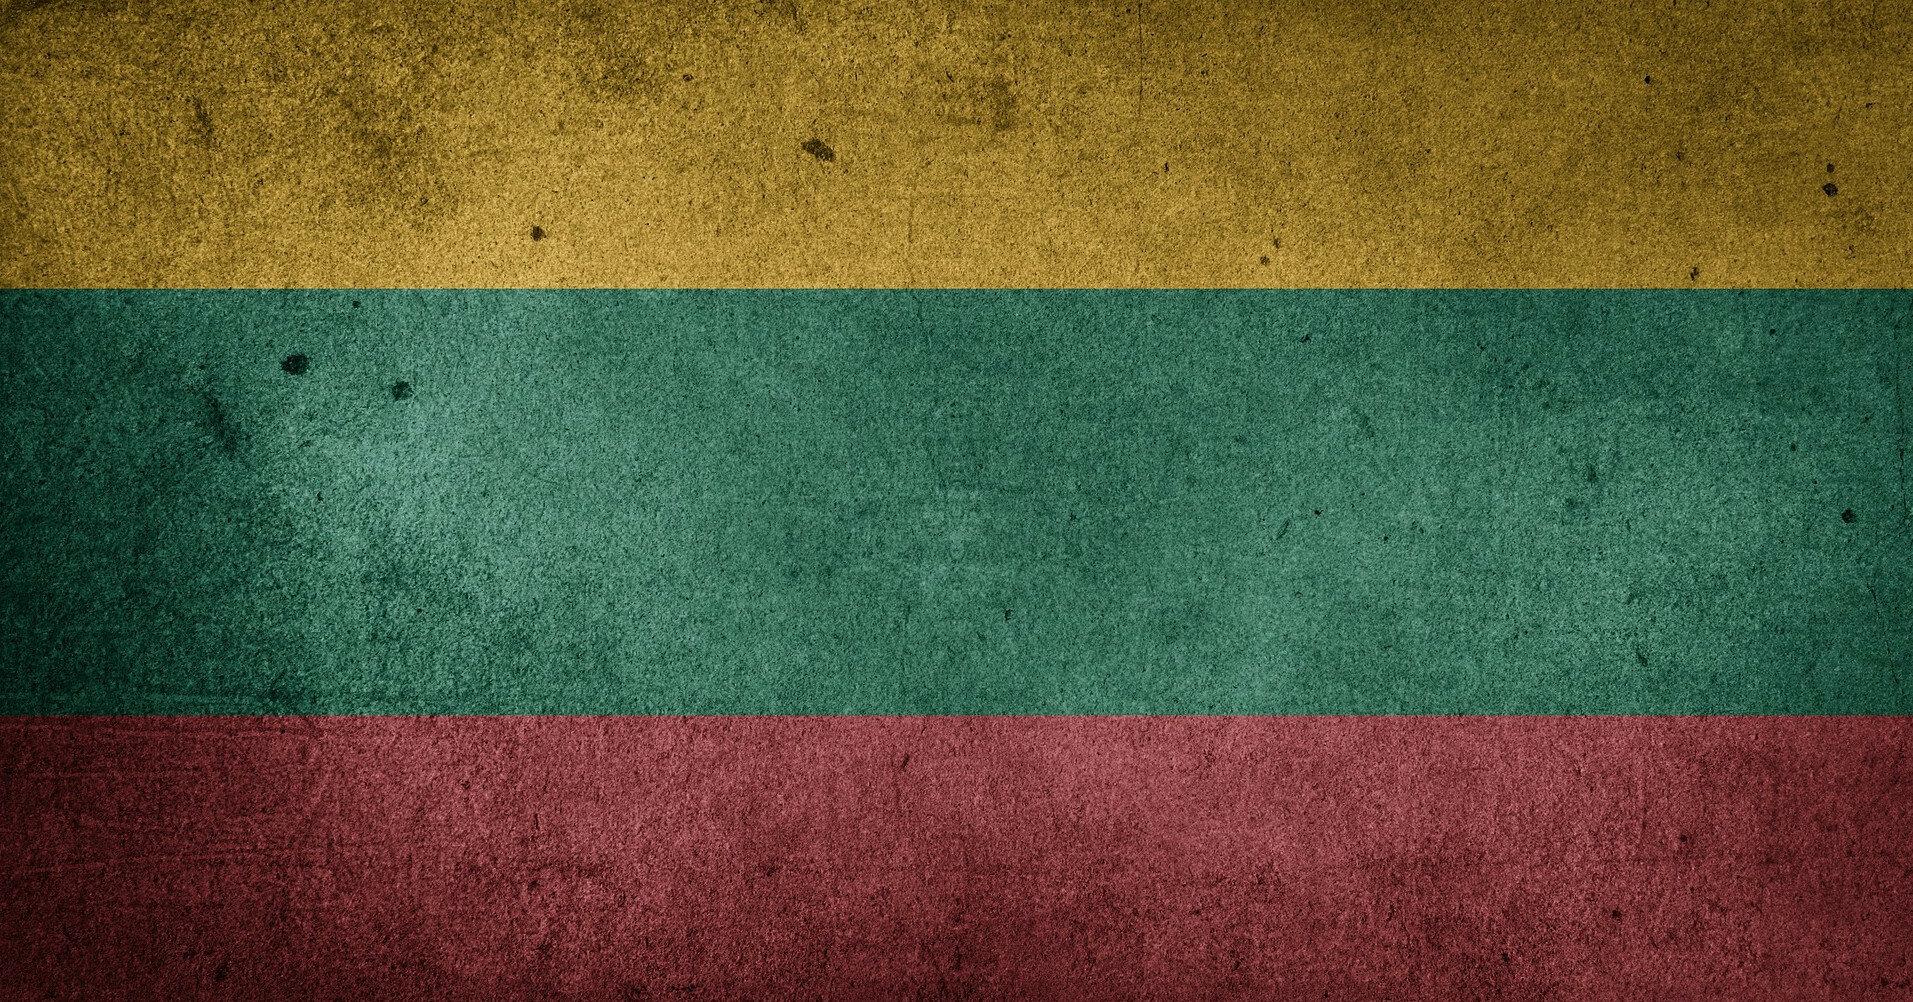 Литва ограничивает права мигрантов